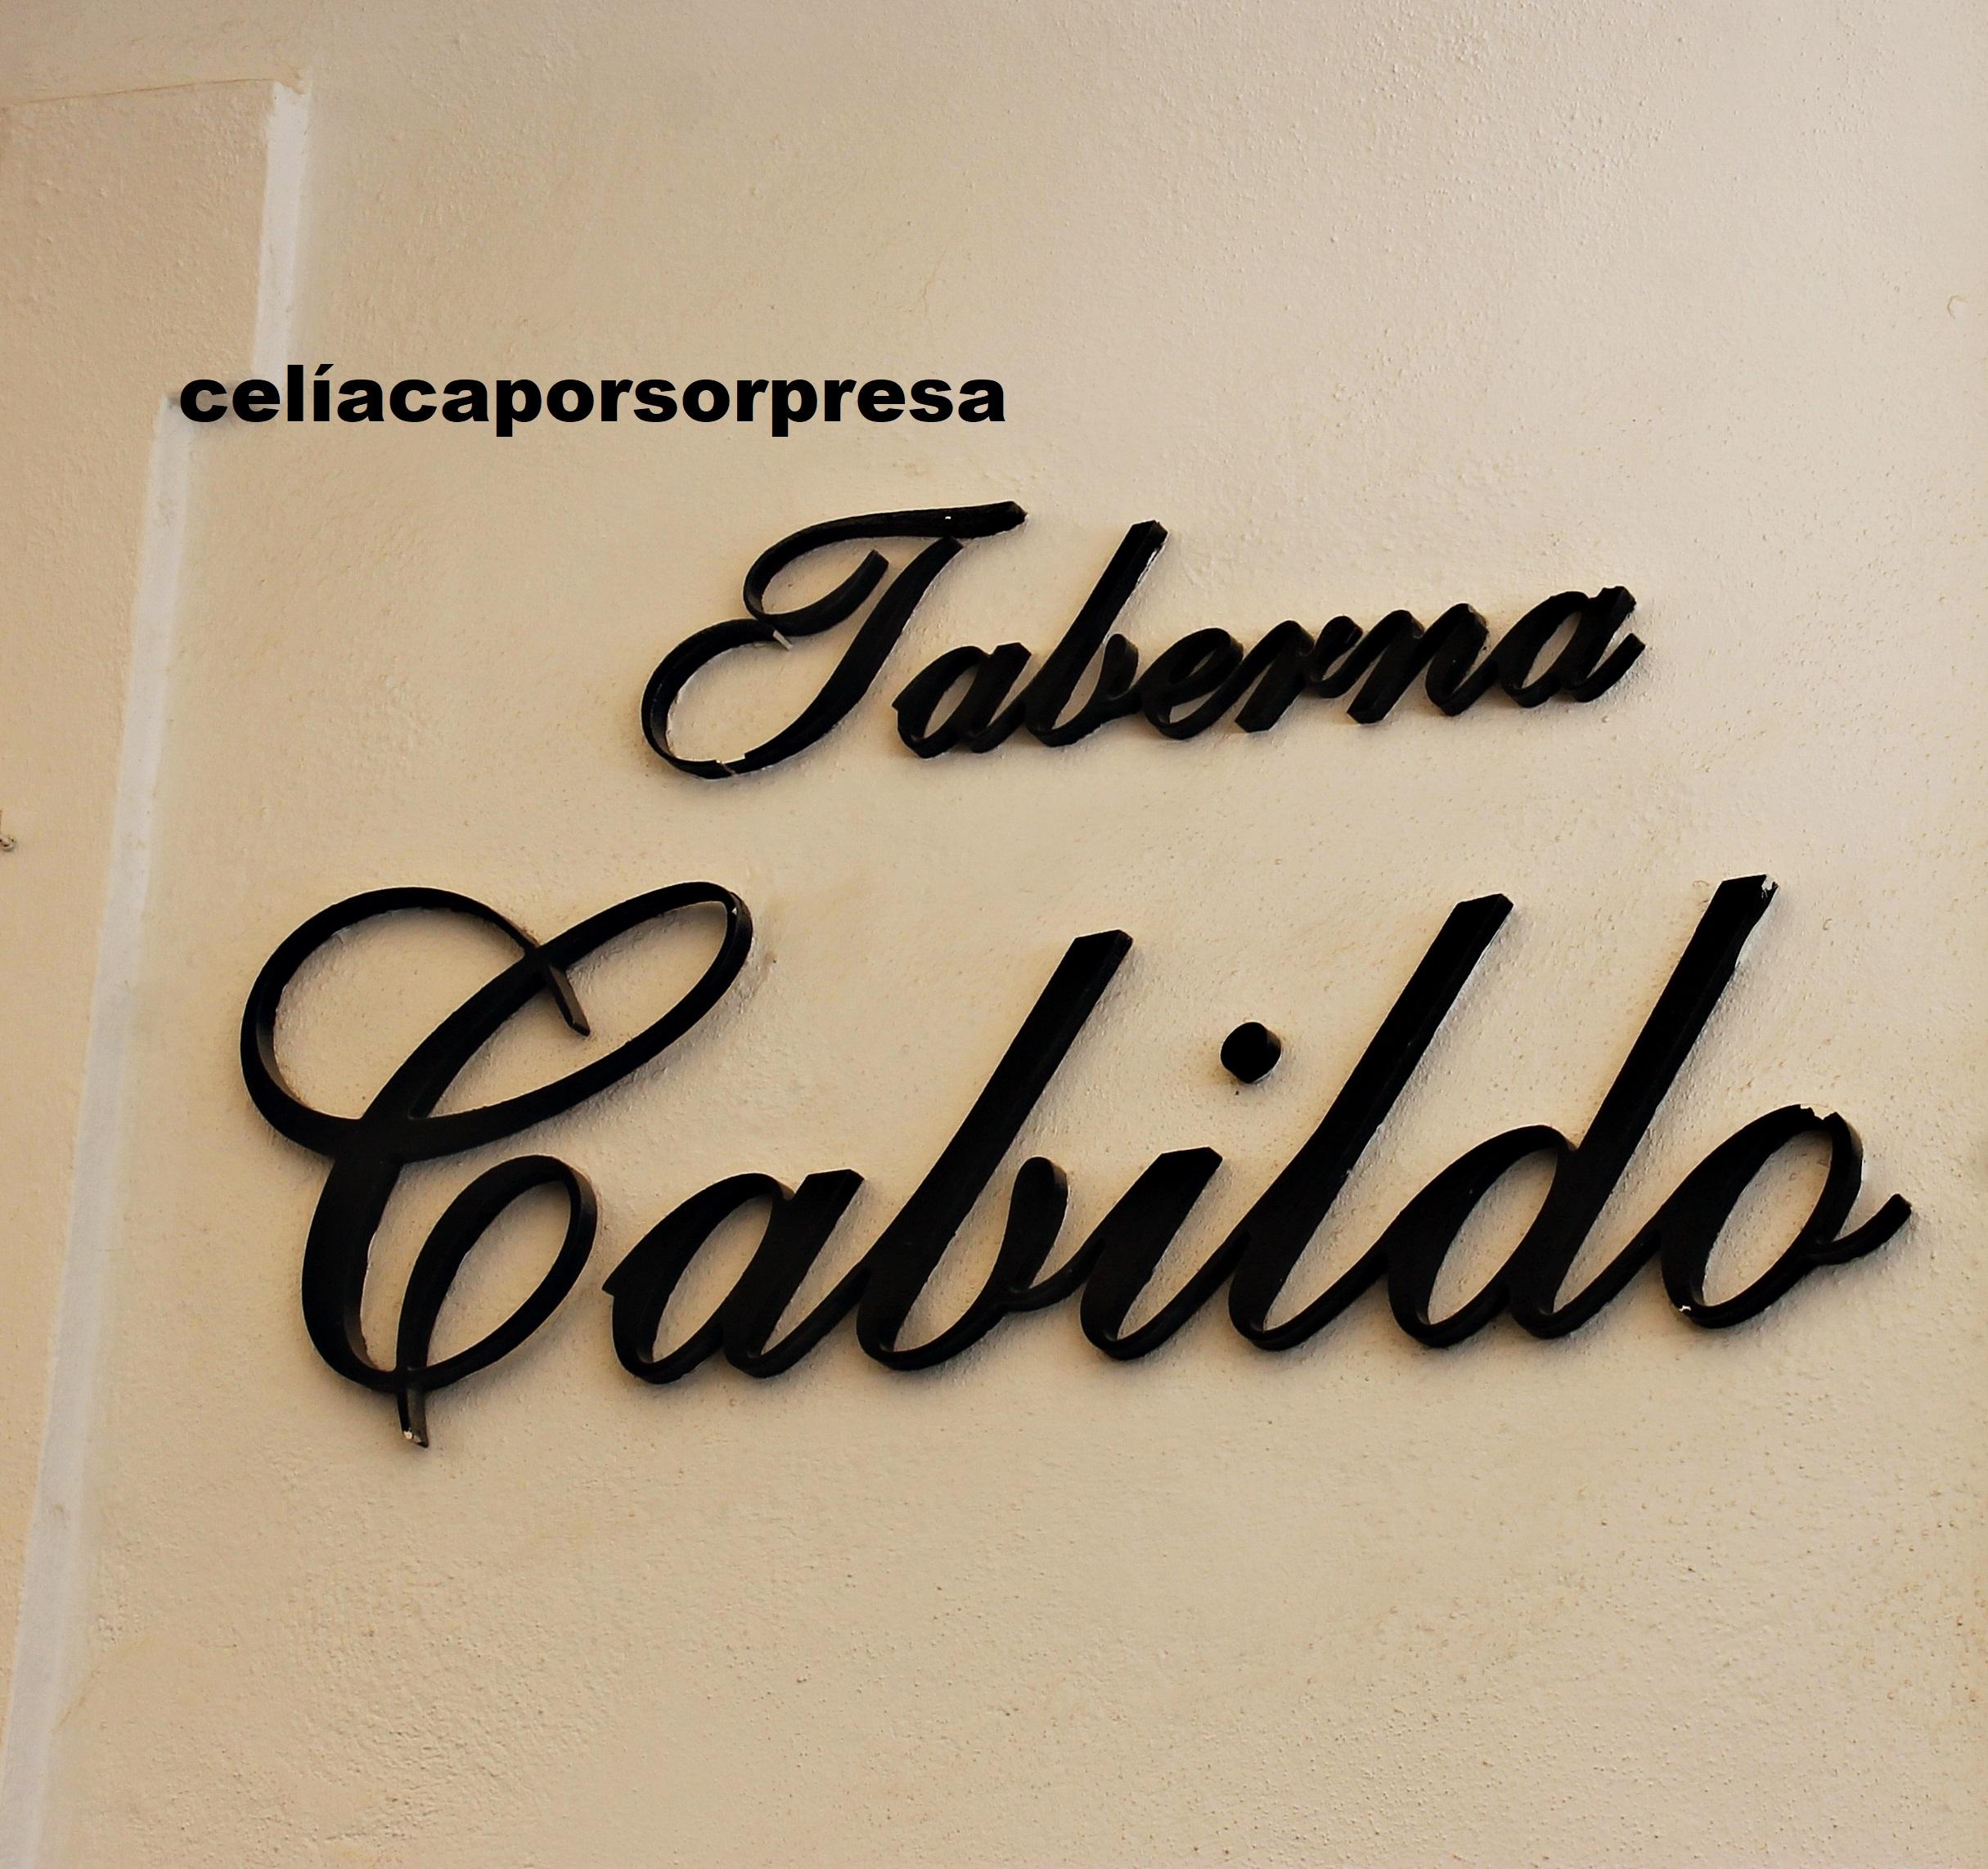 taberna-cabildo